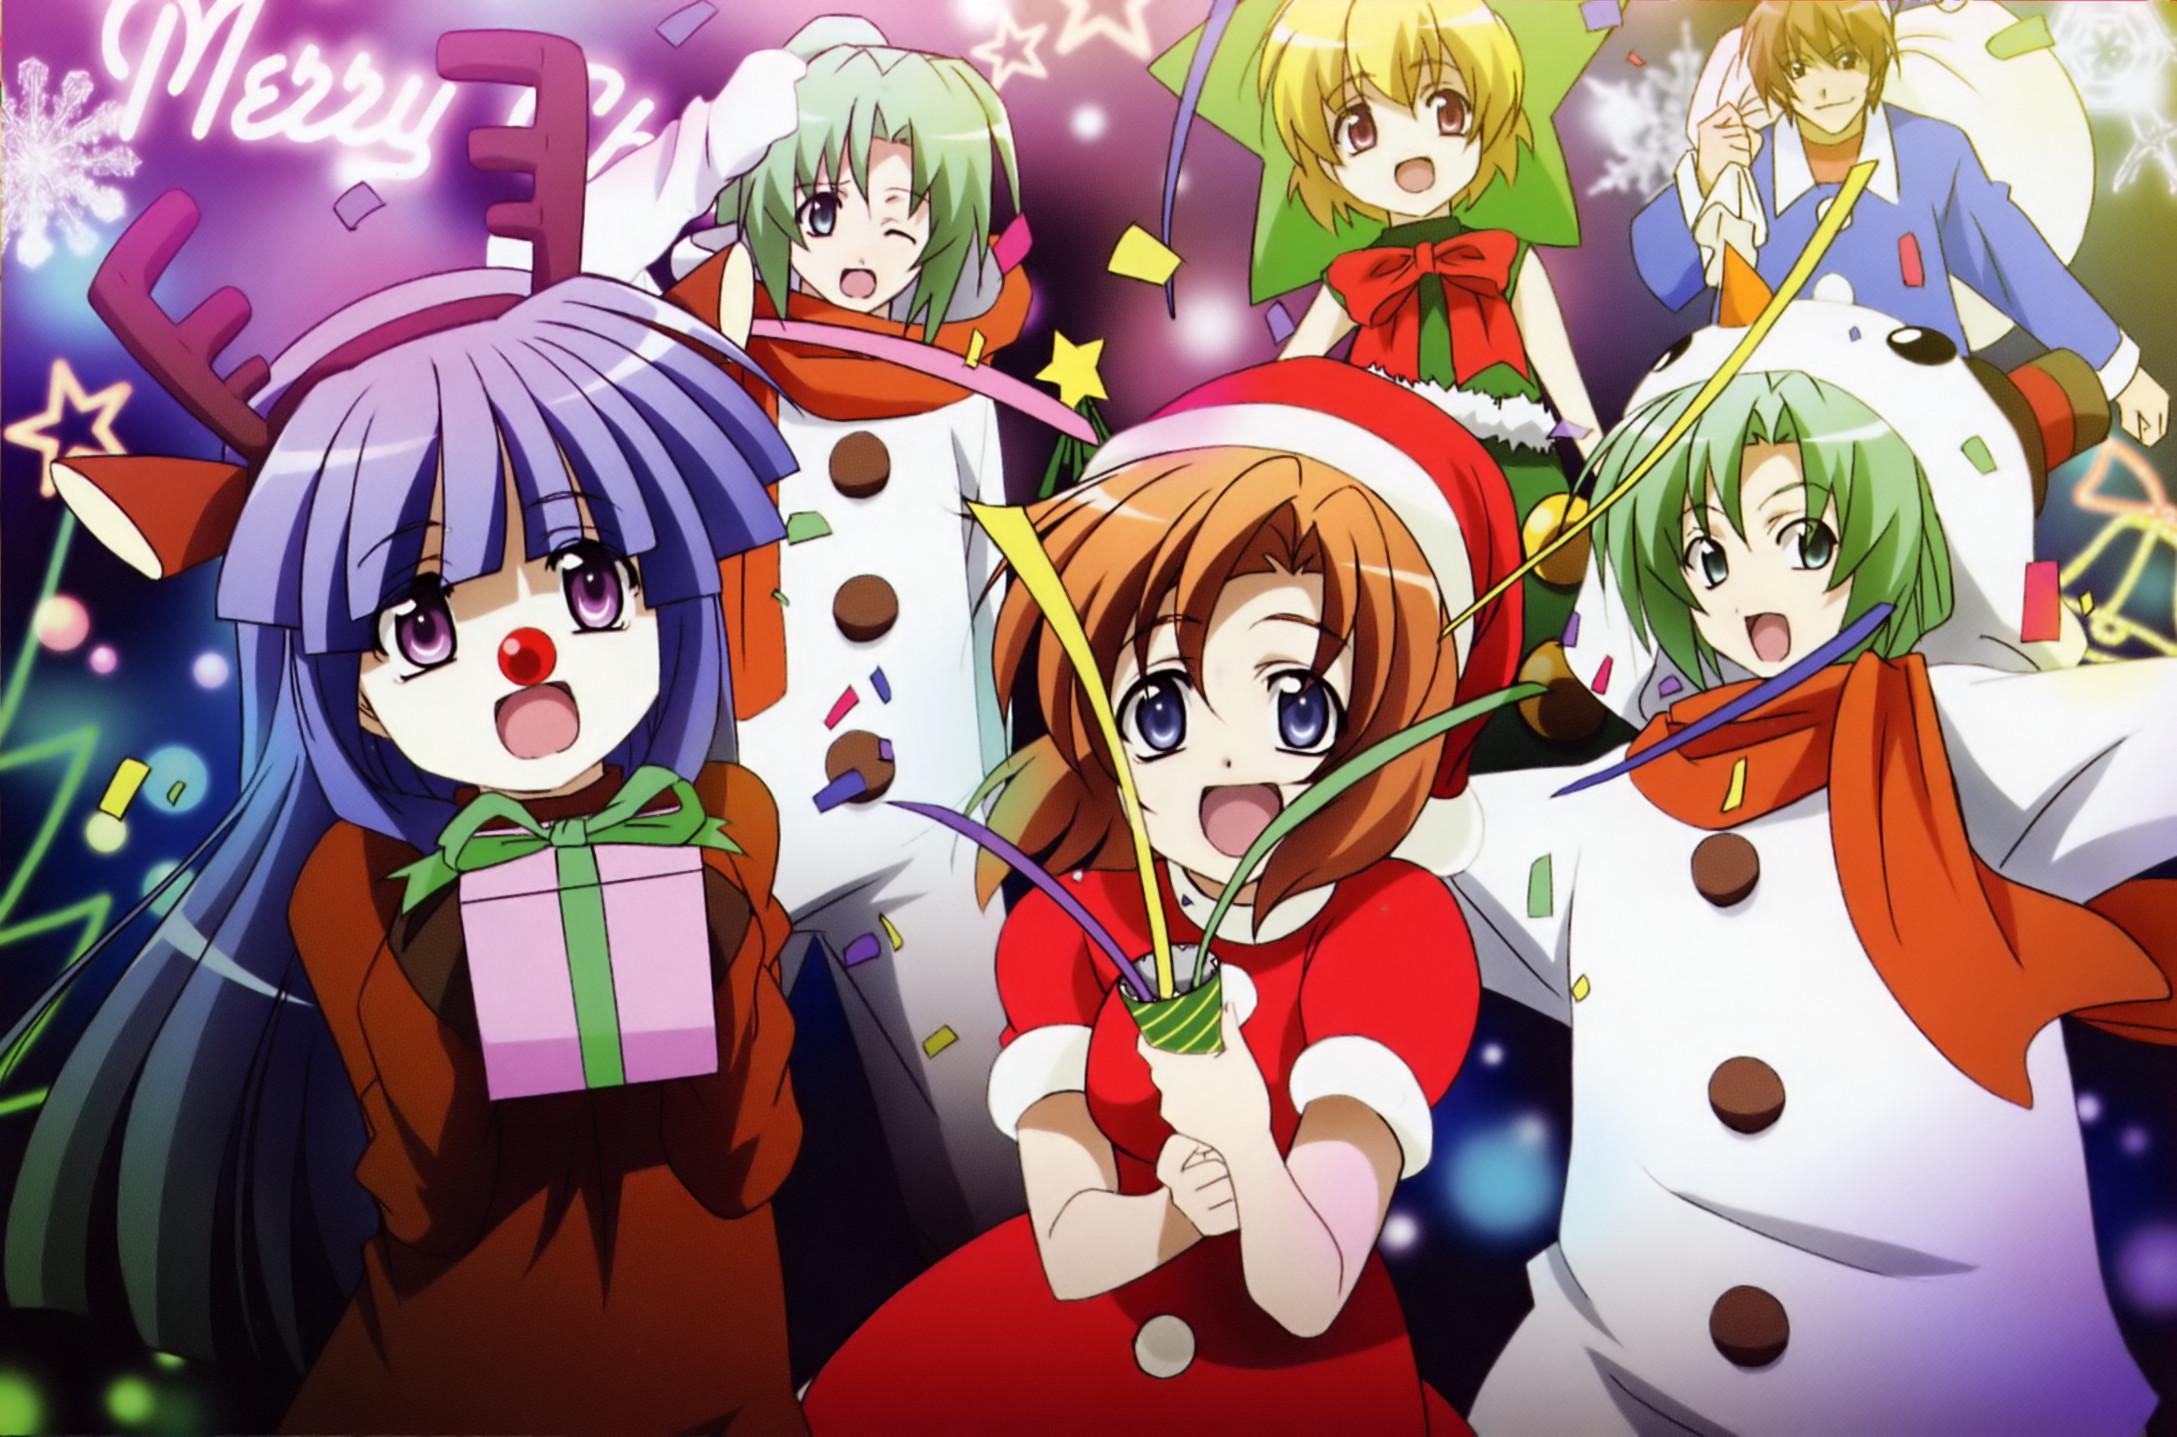 Christmas Cute Anime Wallpapers.